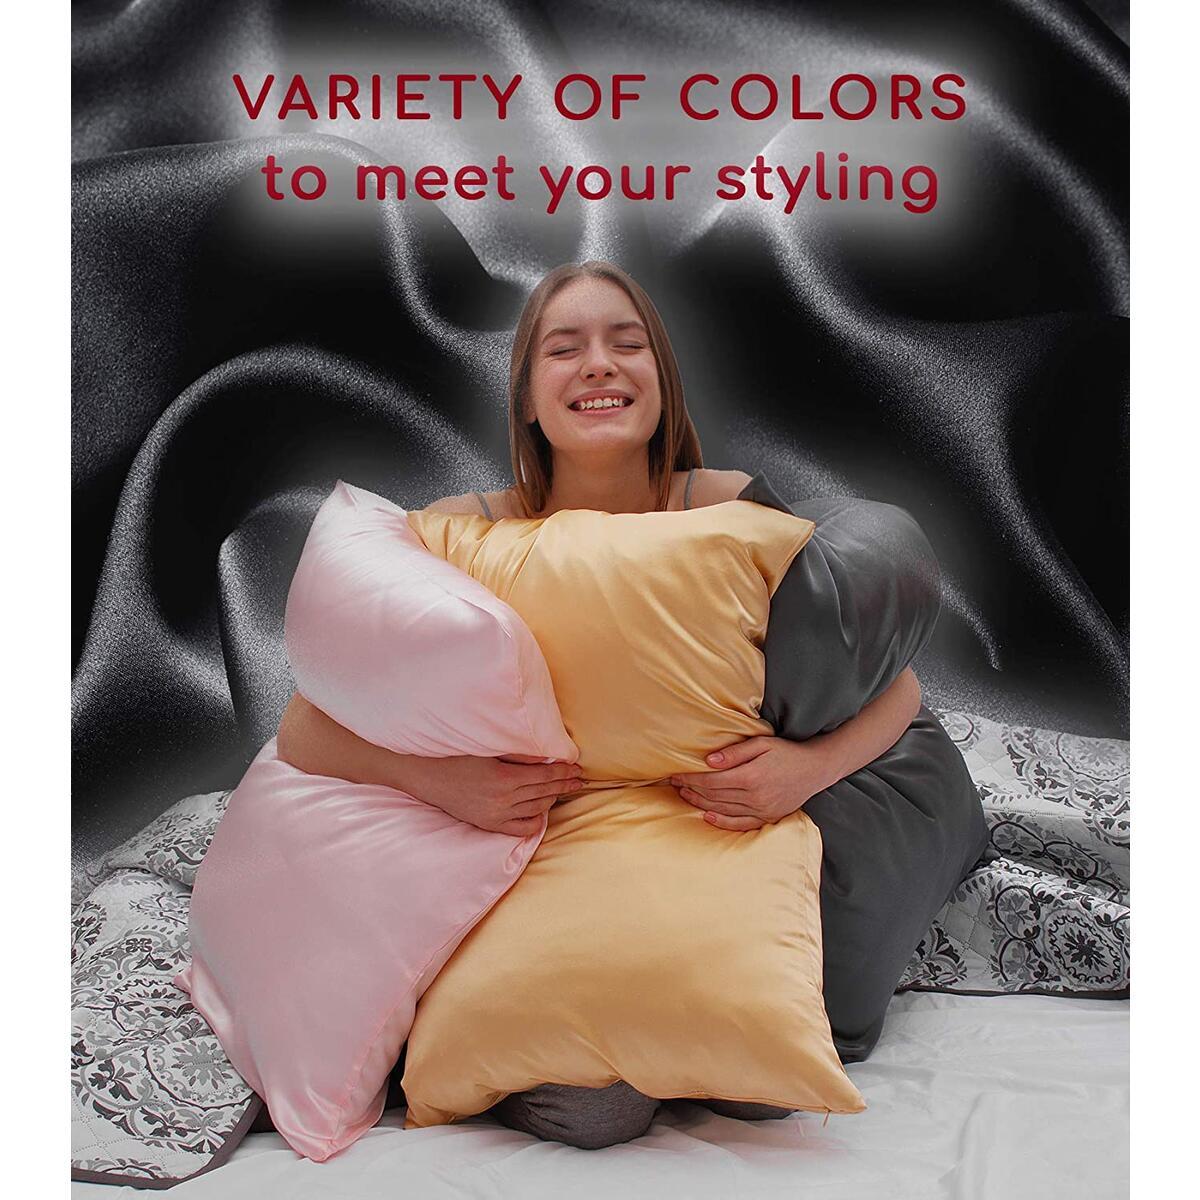 Mellanni Silk Pillowcase for Hair and Skin - Both Sides 100% Pure Natural Mulberry Silk - 19 Momme - Hidden Zipper ClosurePillow Case- (Standard 20